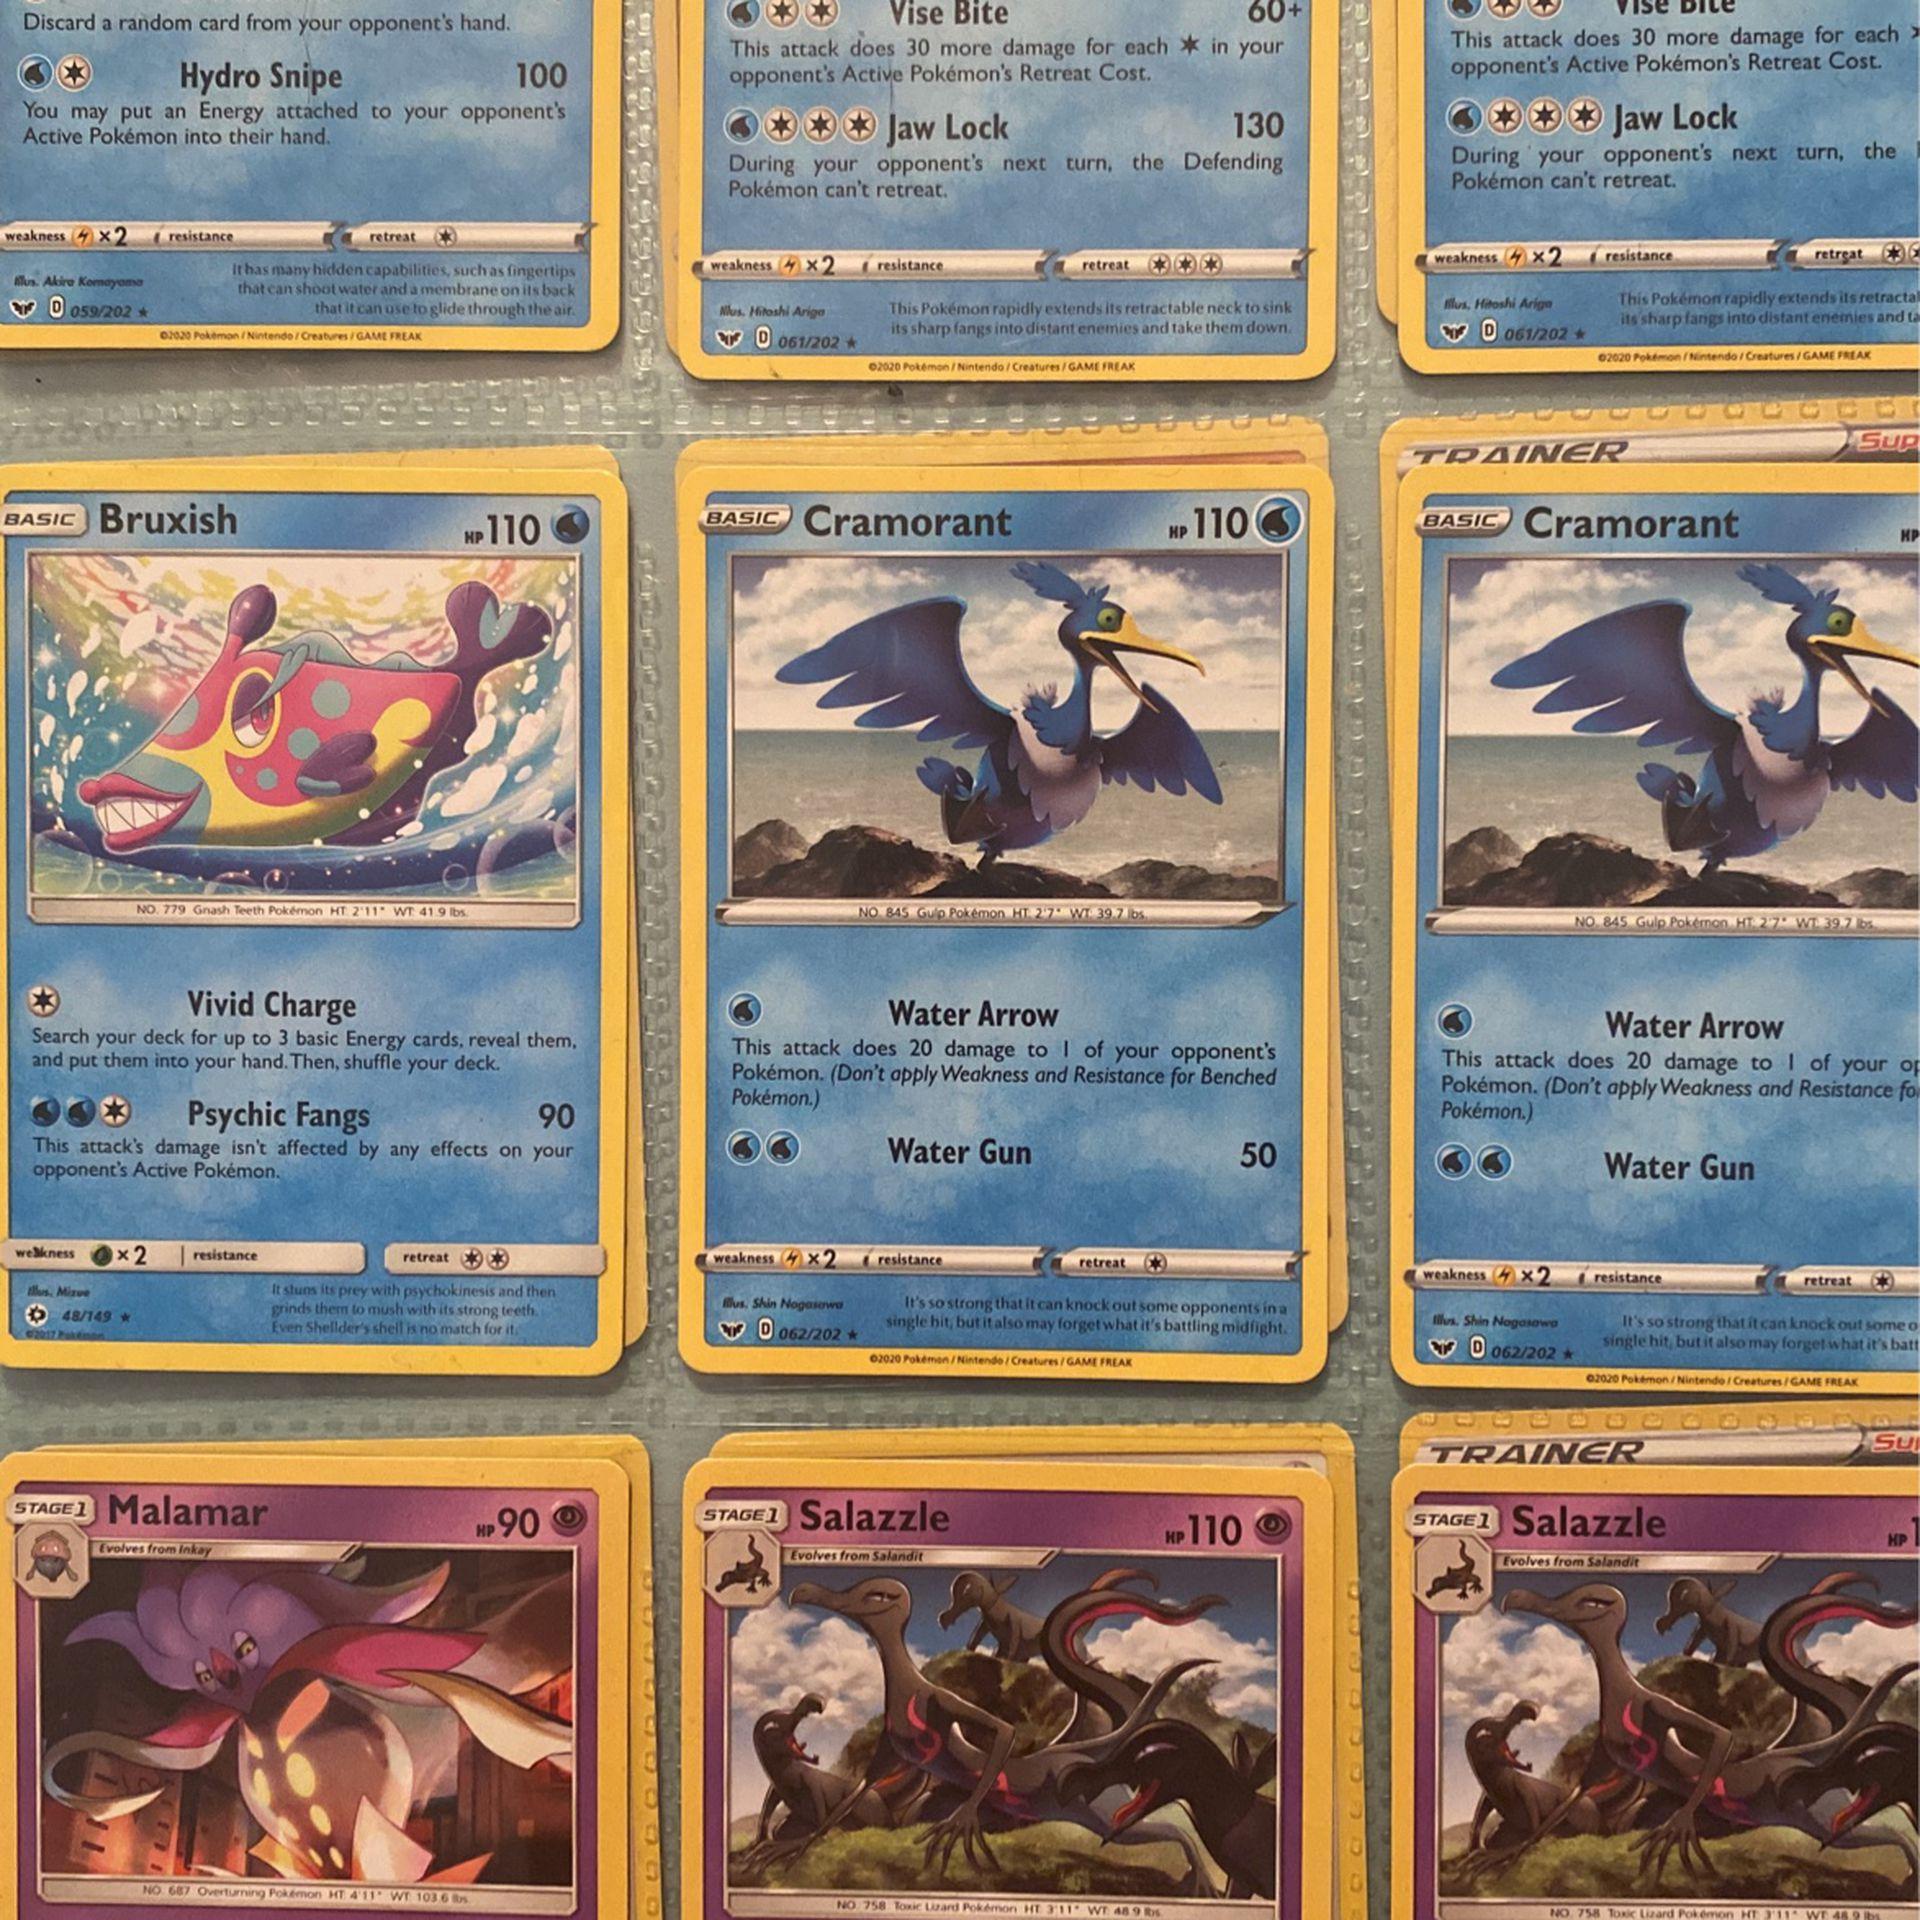 27 Rare Pokémon Cards, Collectors